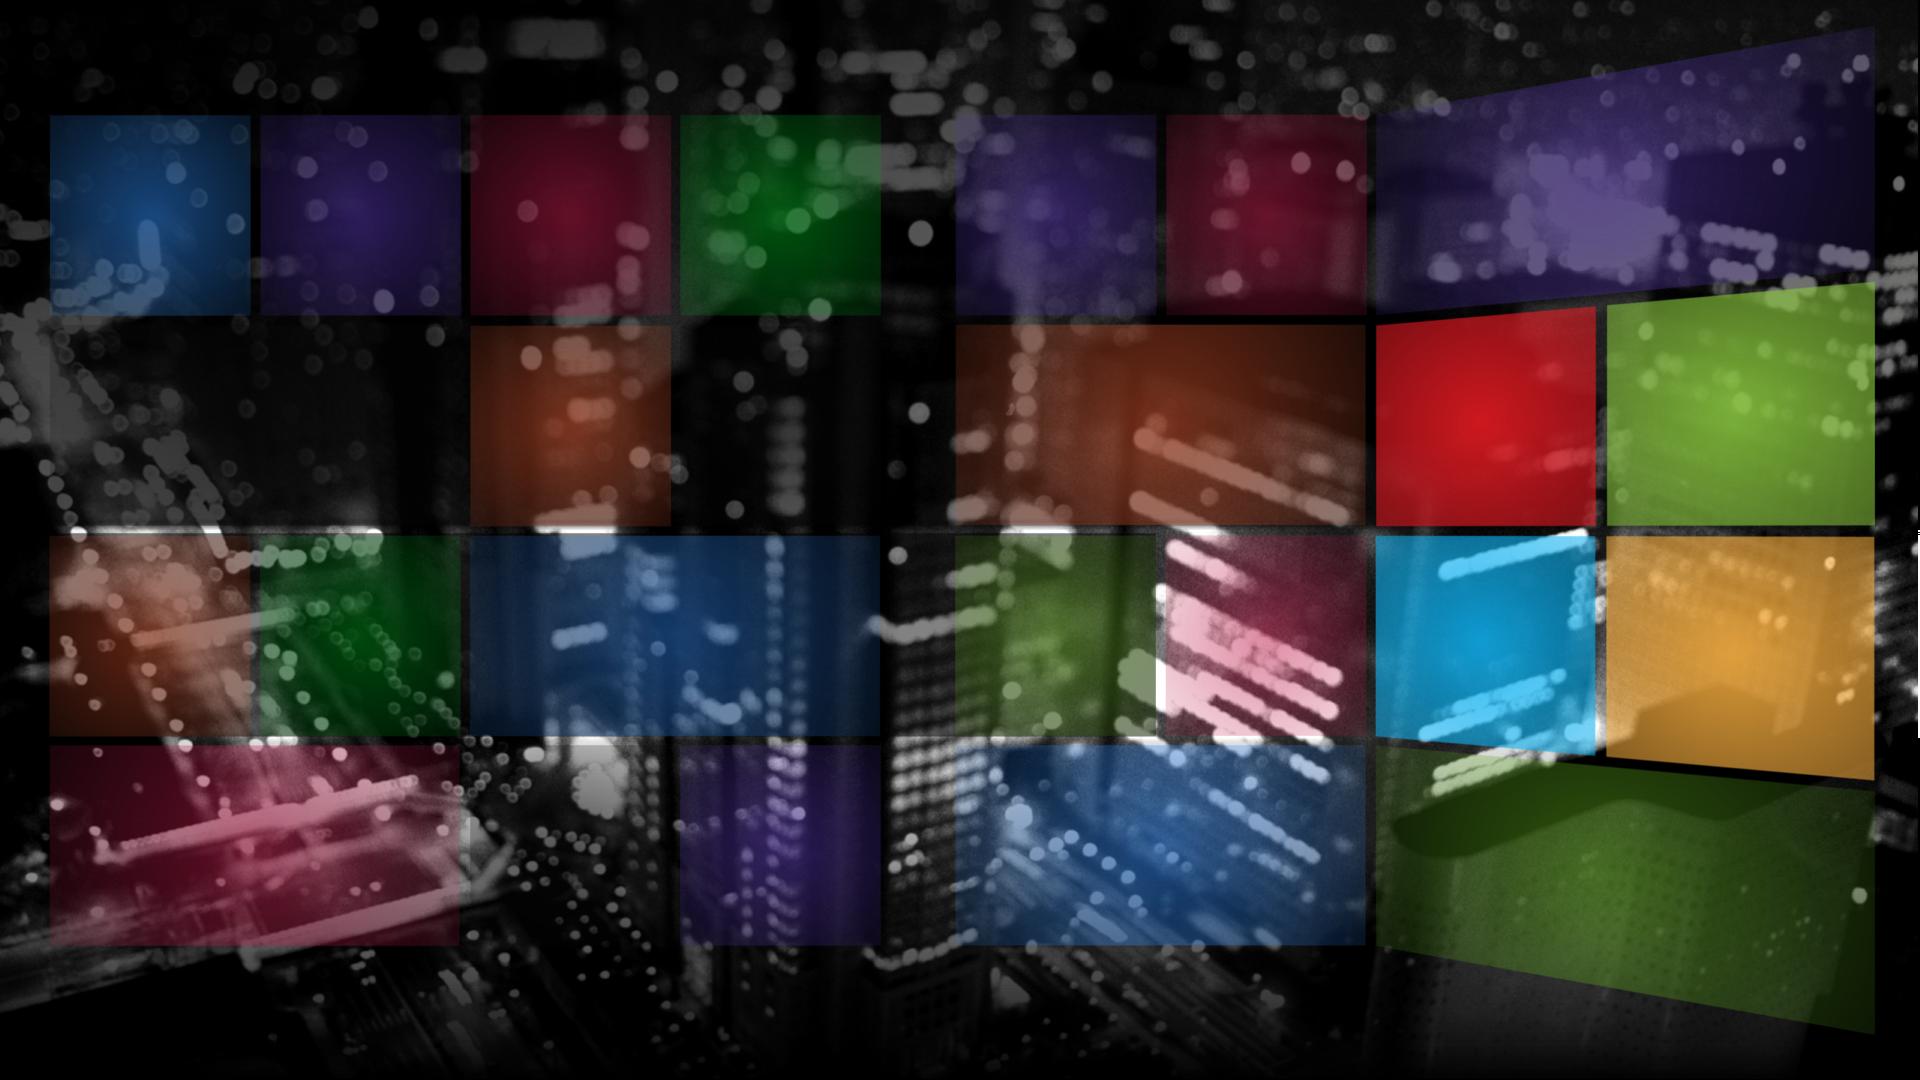 metropolis 2.0 wallpaper by octogonpc